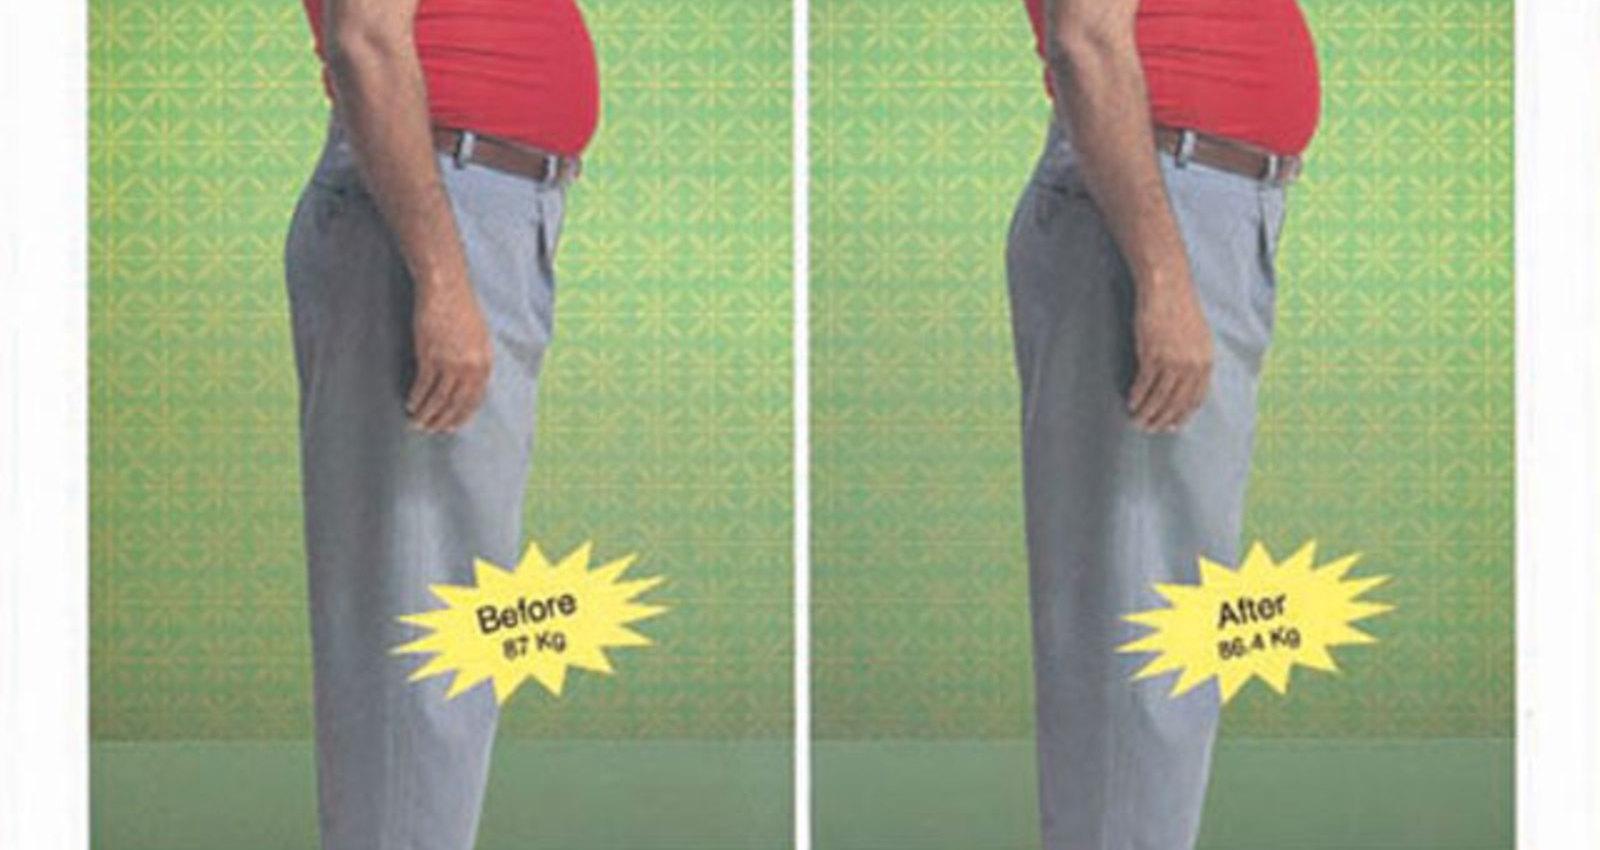 Before 42 kg/ Before 87kg/ Before 91 kg